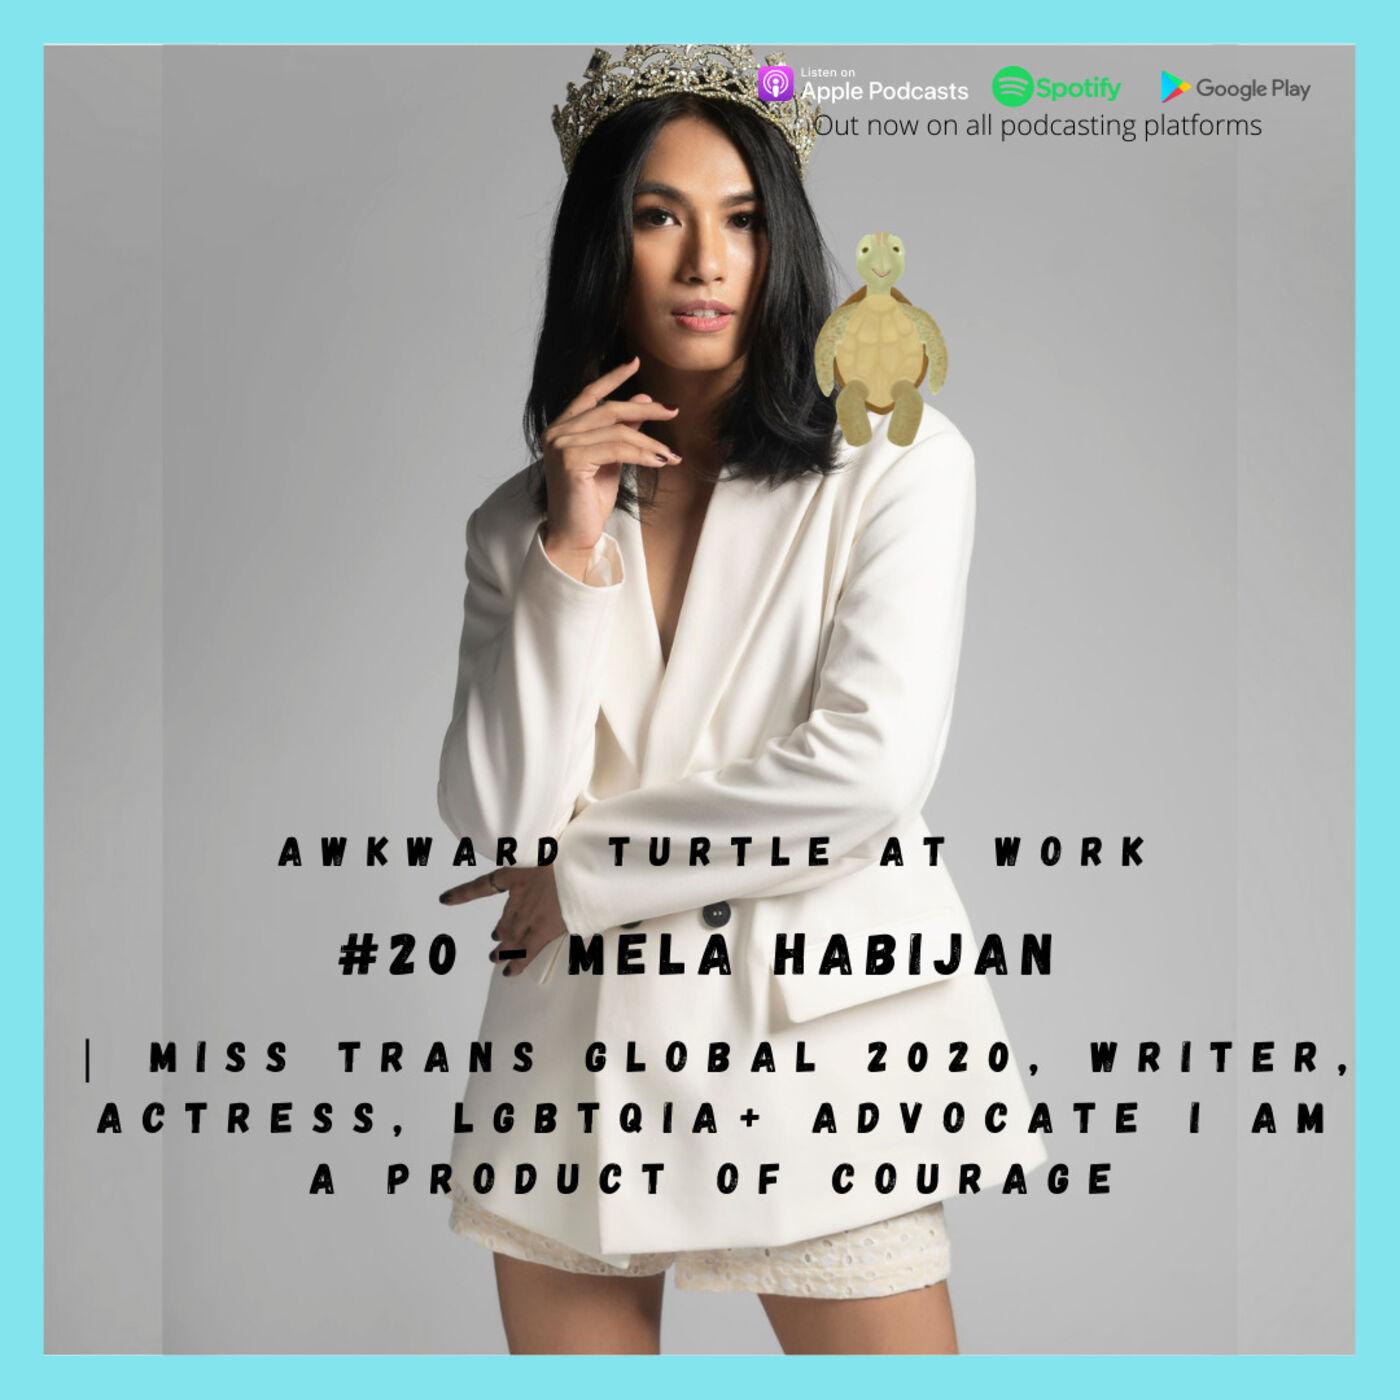 #20 - Mela Habijan | Miss Trans Global 2020, Writer, Actress, LGBTQIA+ Advocate | I am a product of courage